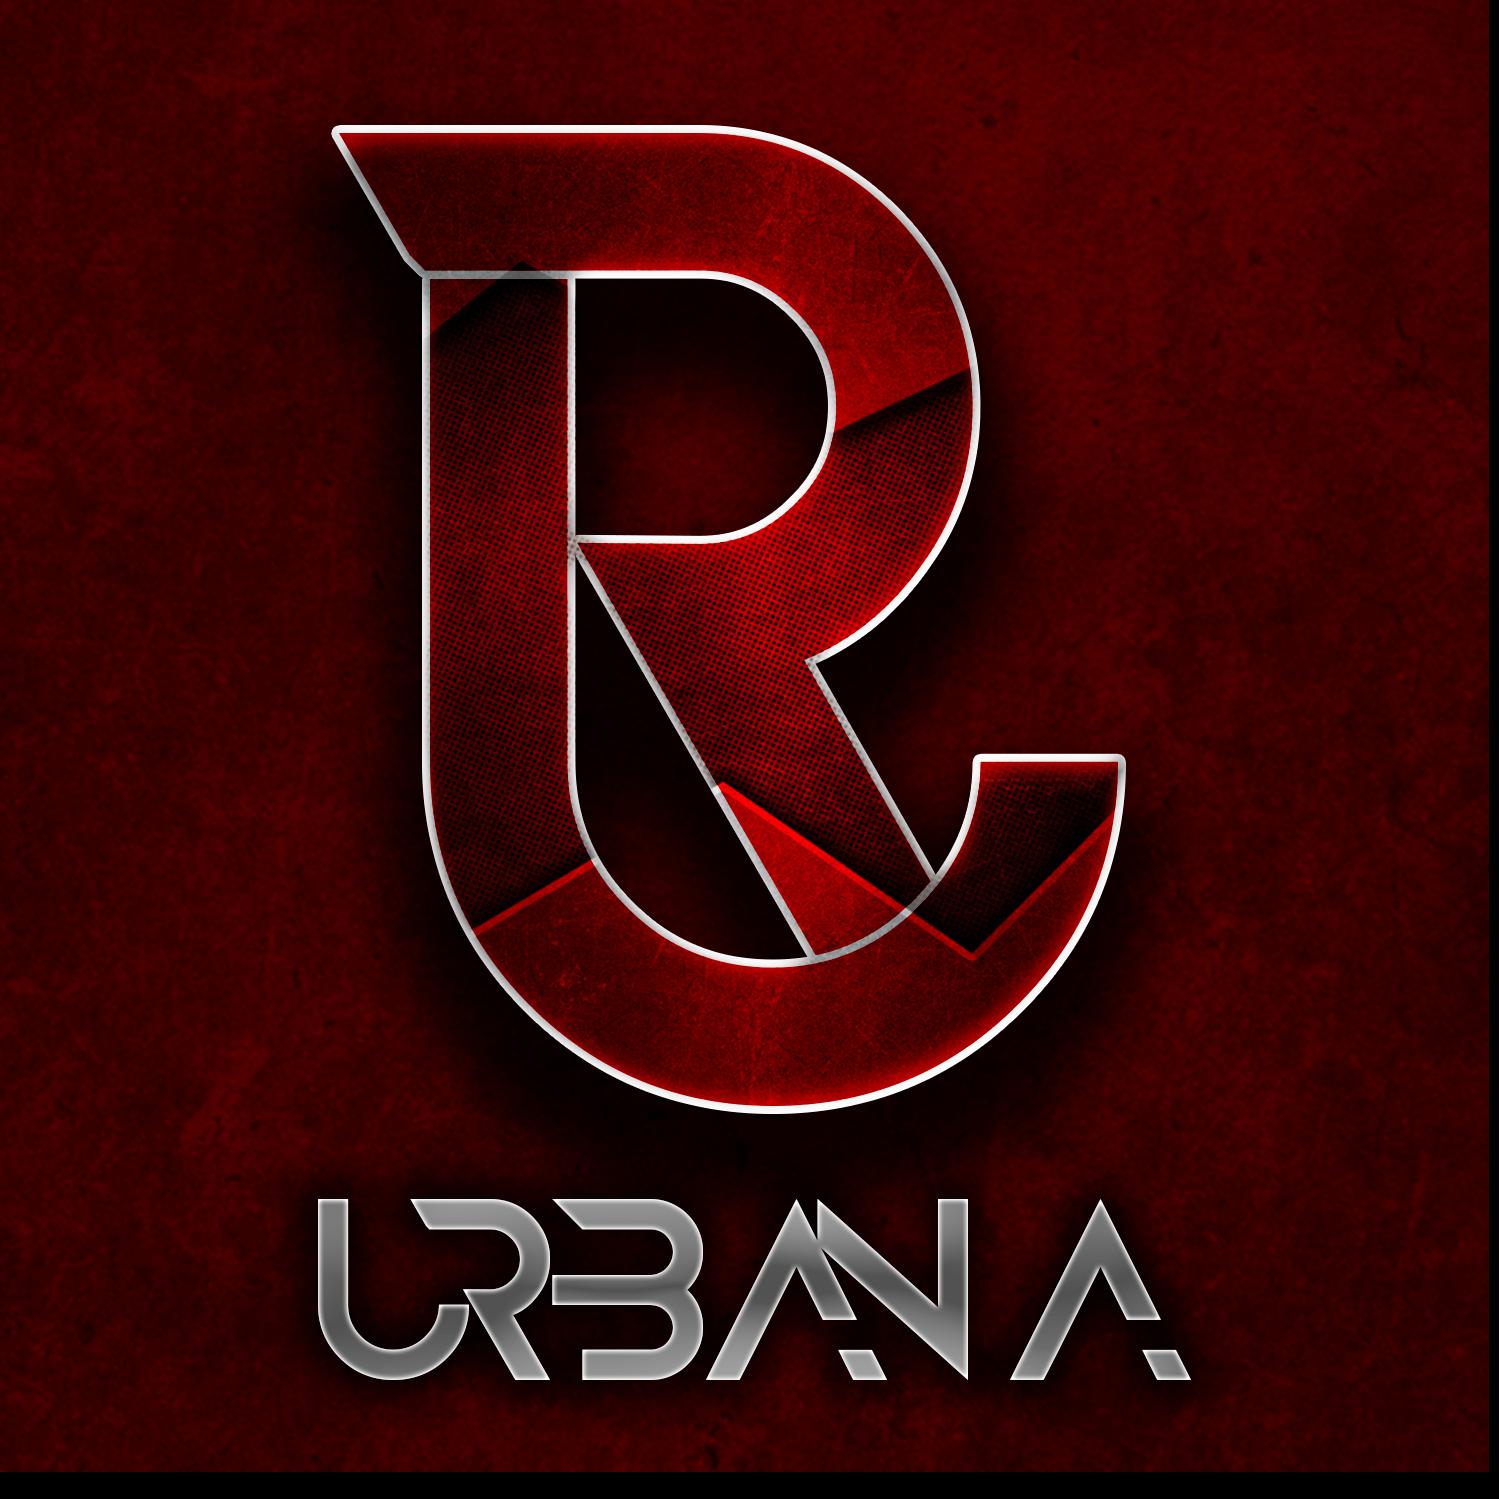 Urbana Honduras